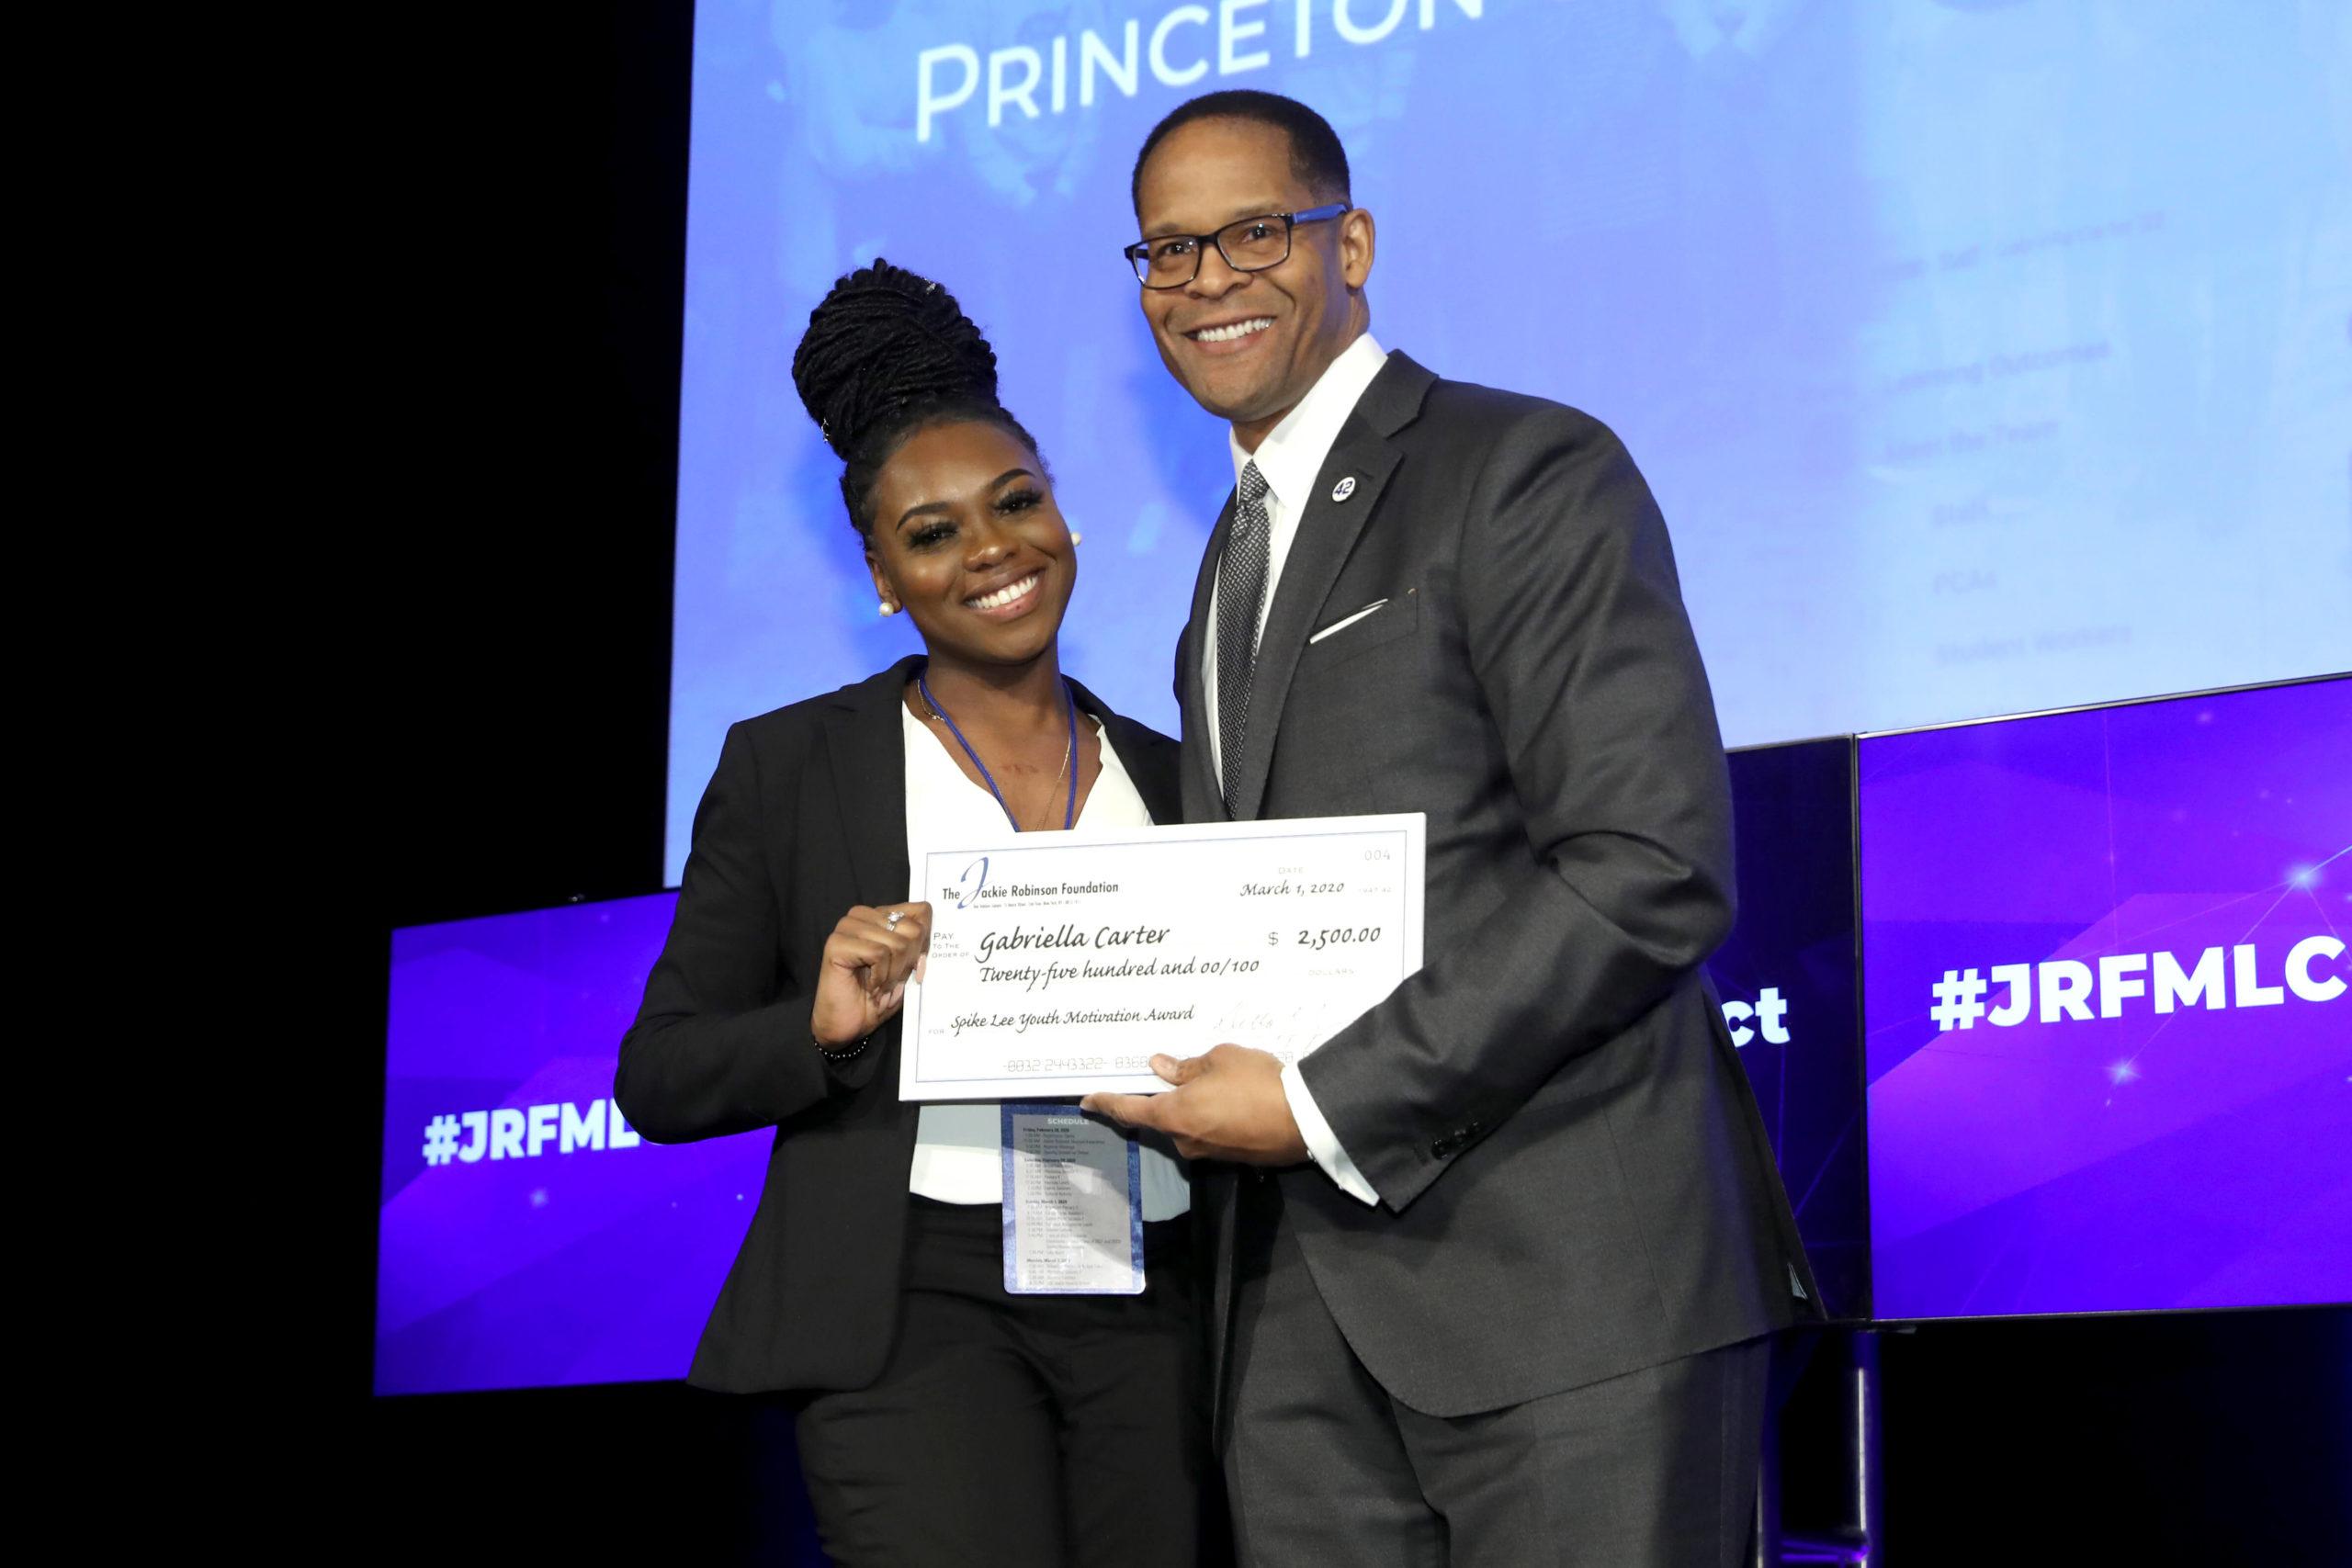 Gabriella Carter receiving award at MLC 2020 in New York City